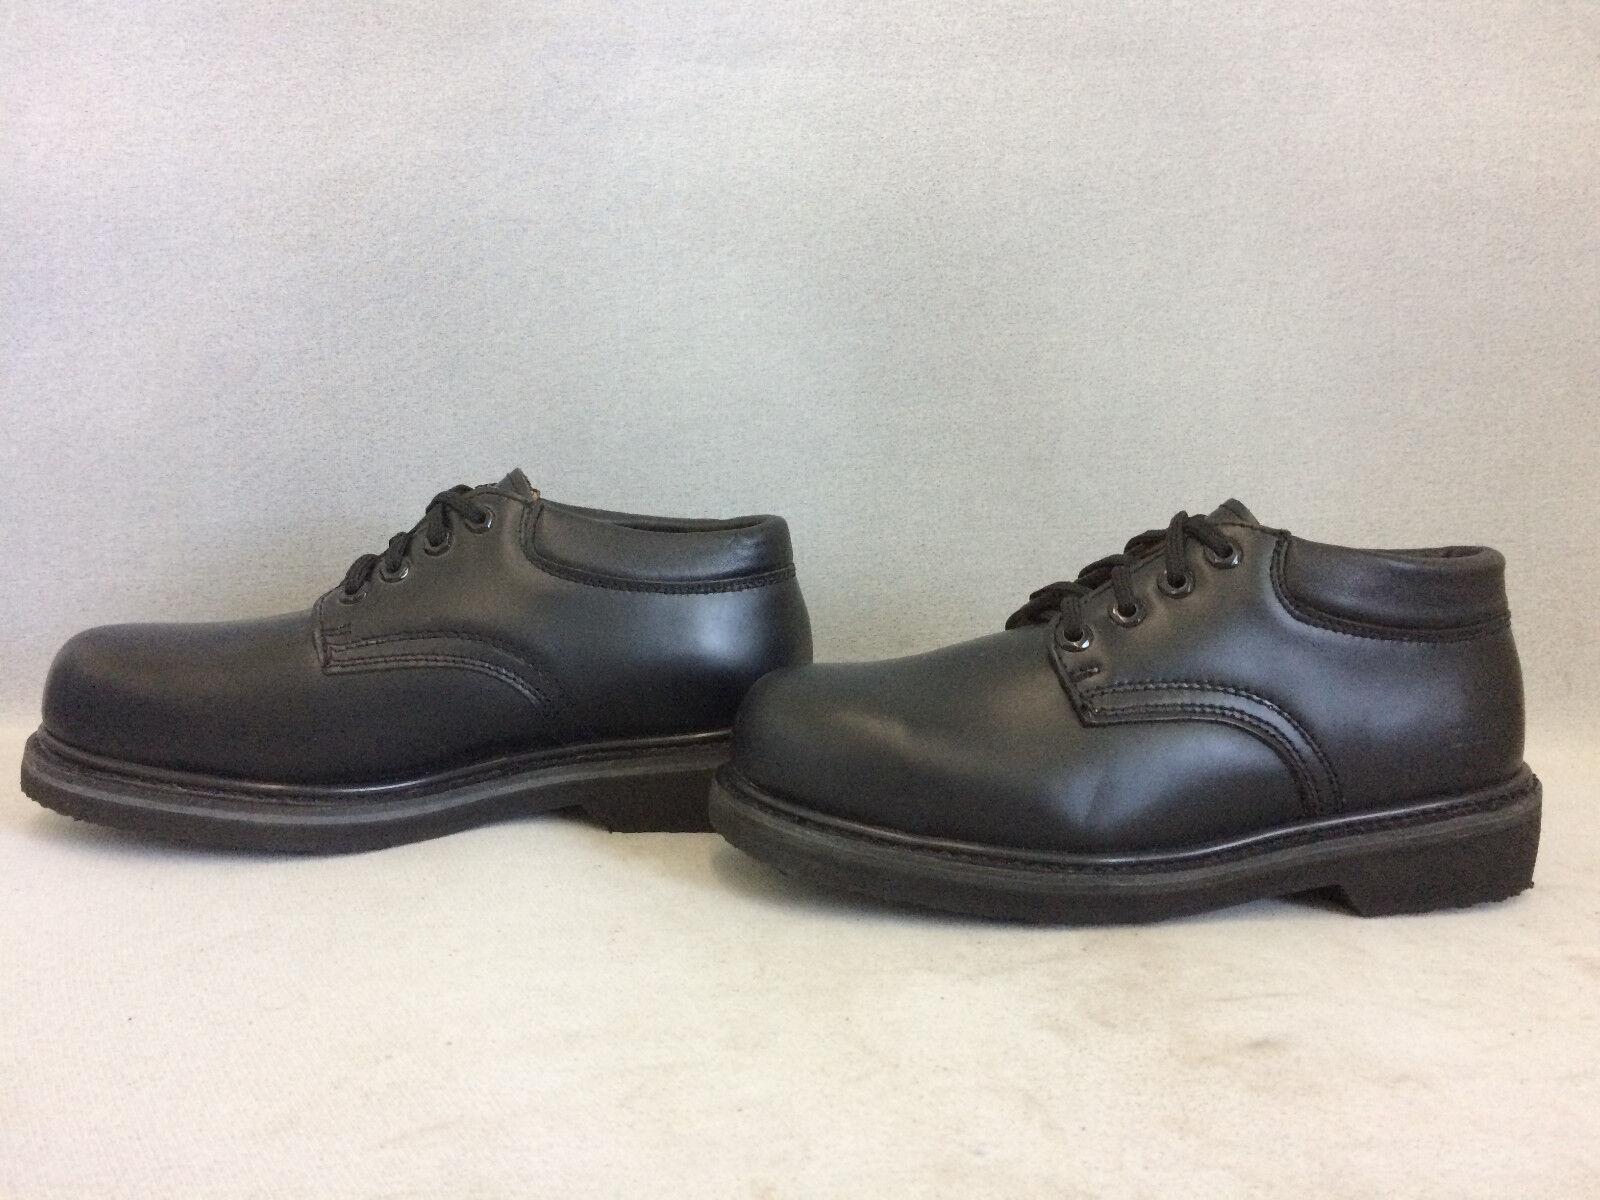 DieHard Men's 82402 Steel Toe Work Oxford  Black Leather Safety shoes